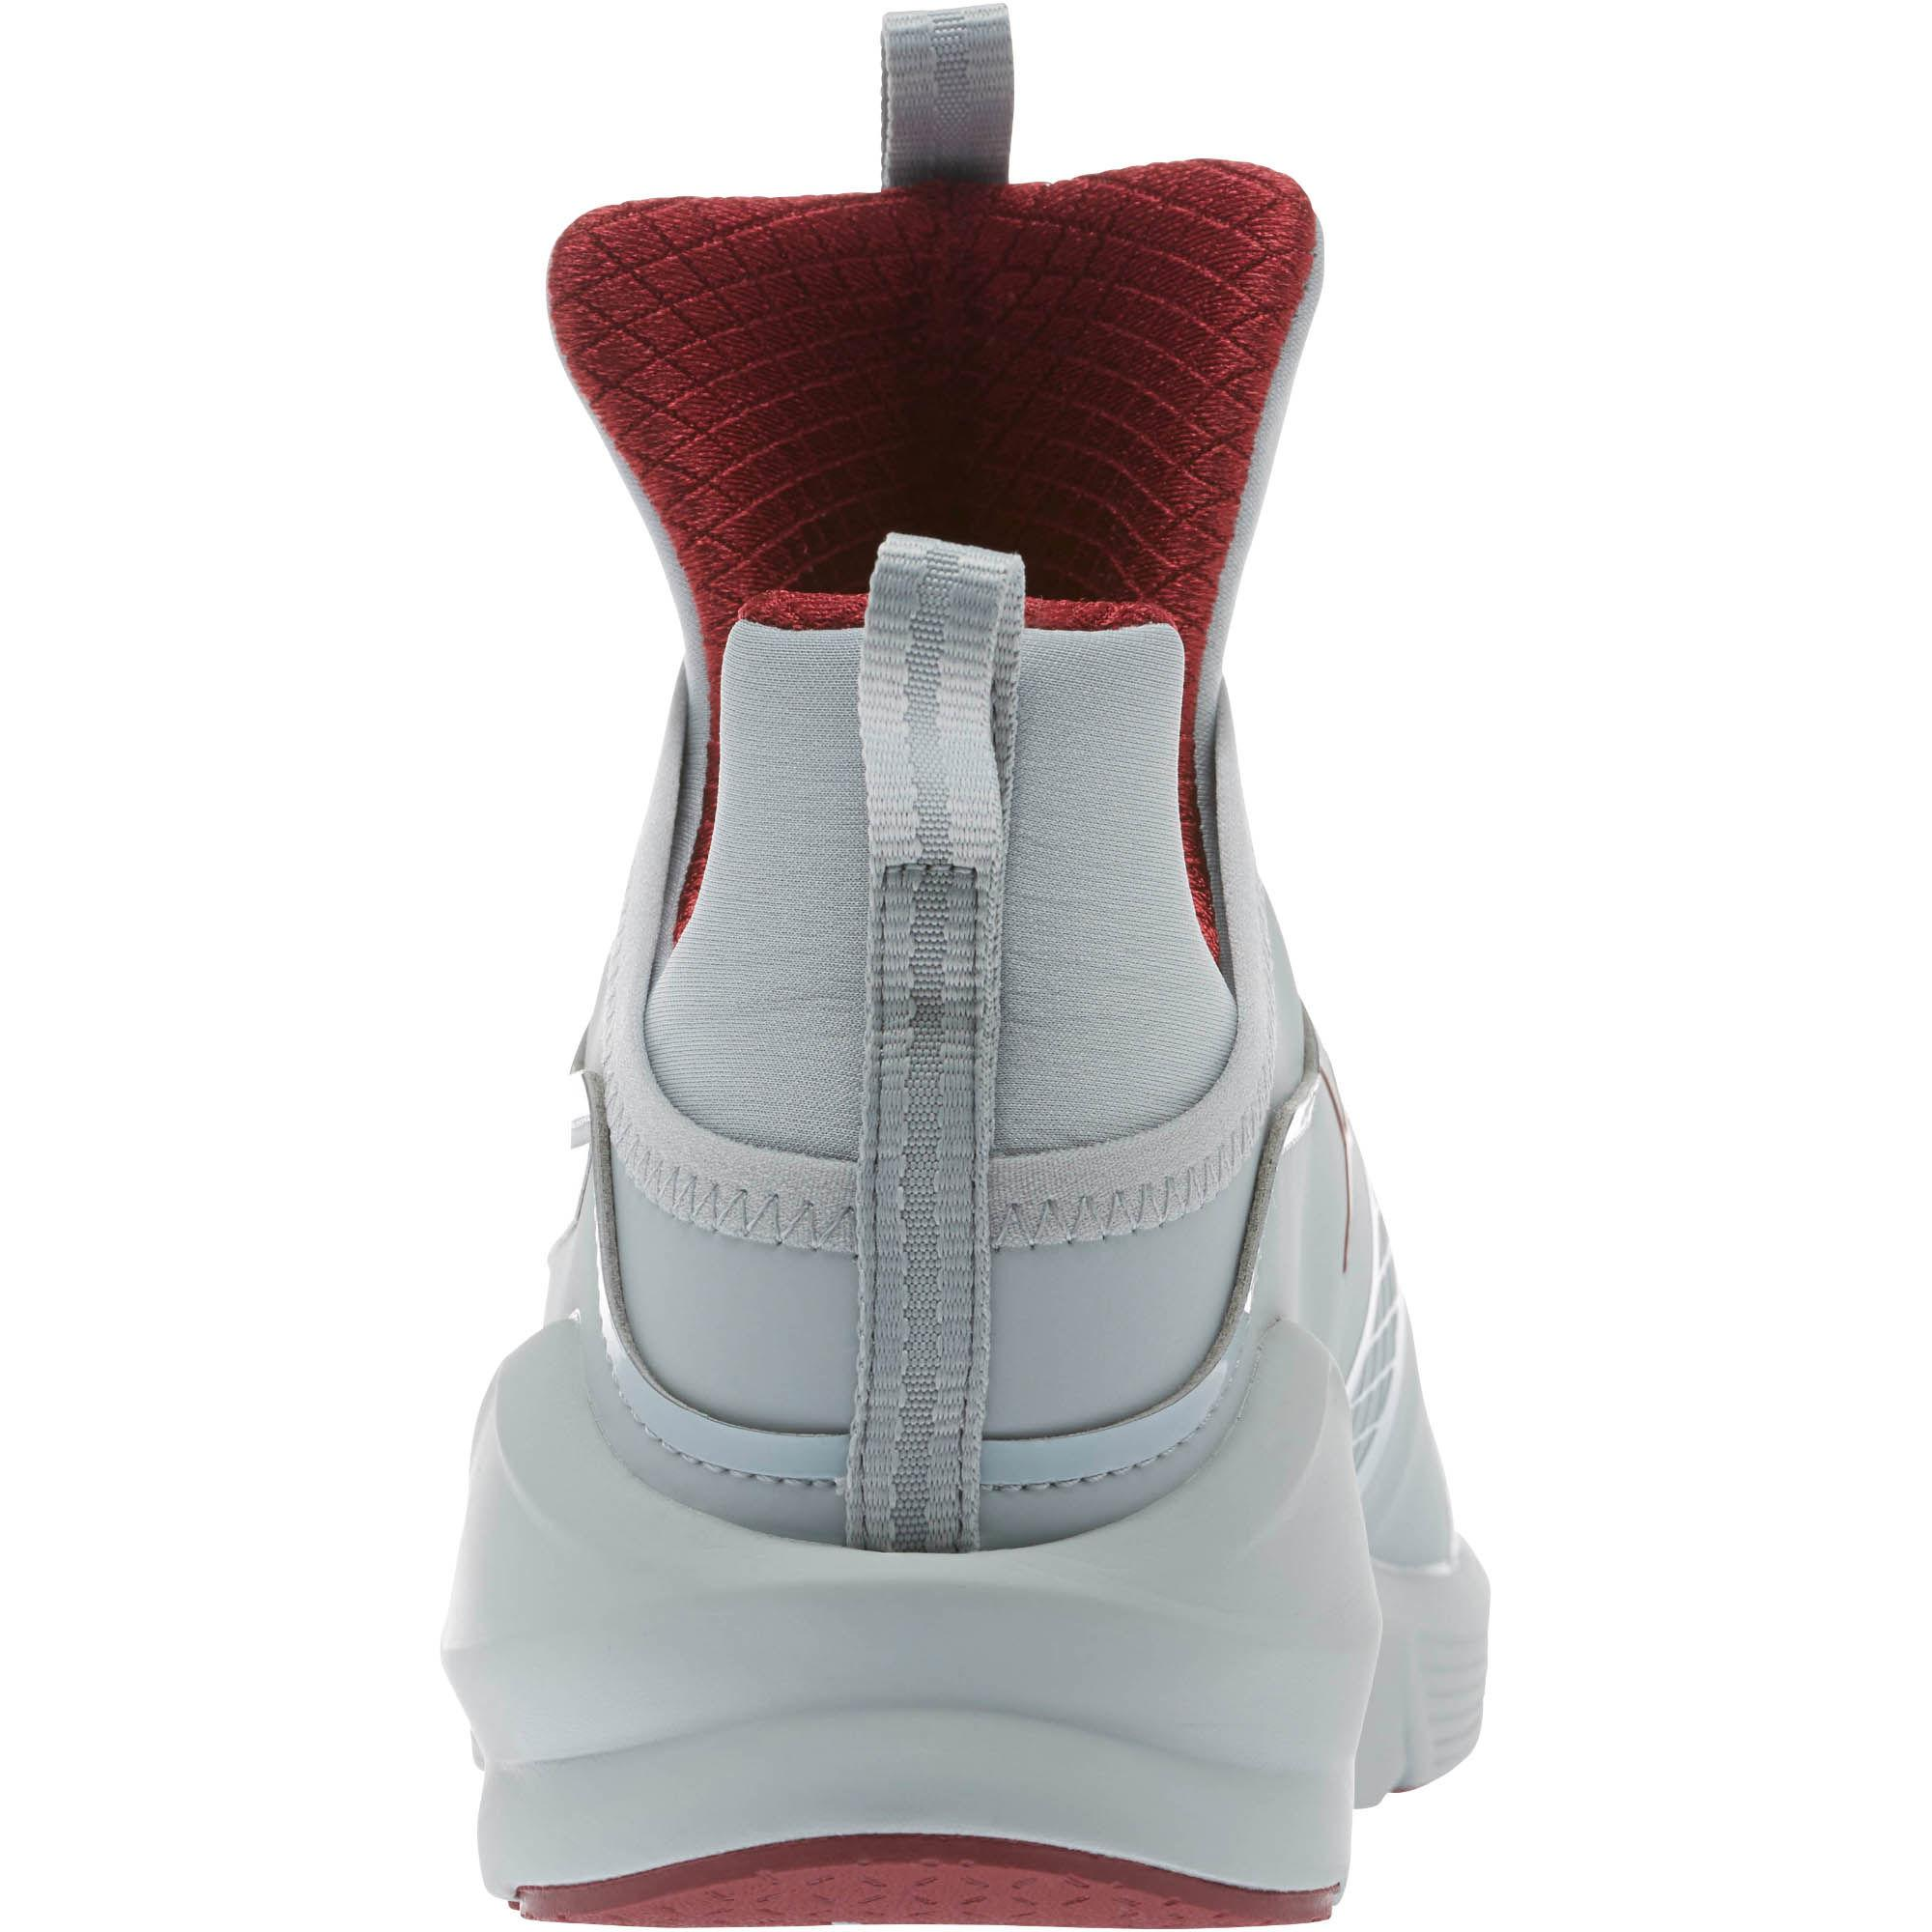 872ff71b227 Lyst - Puma Fierce Nubuck Naturals Women s Training Shoes